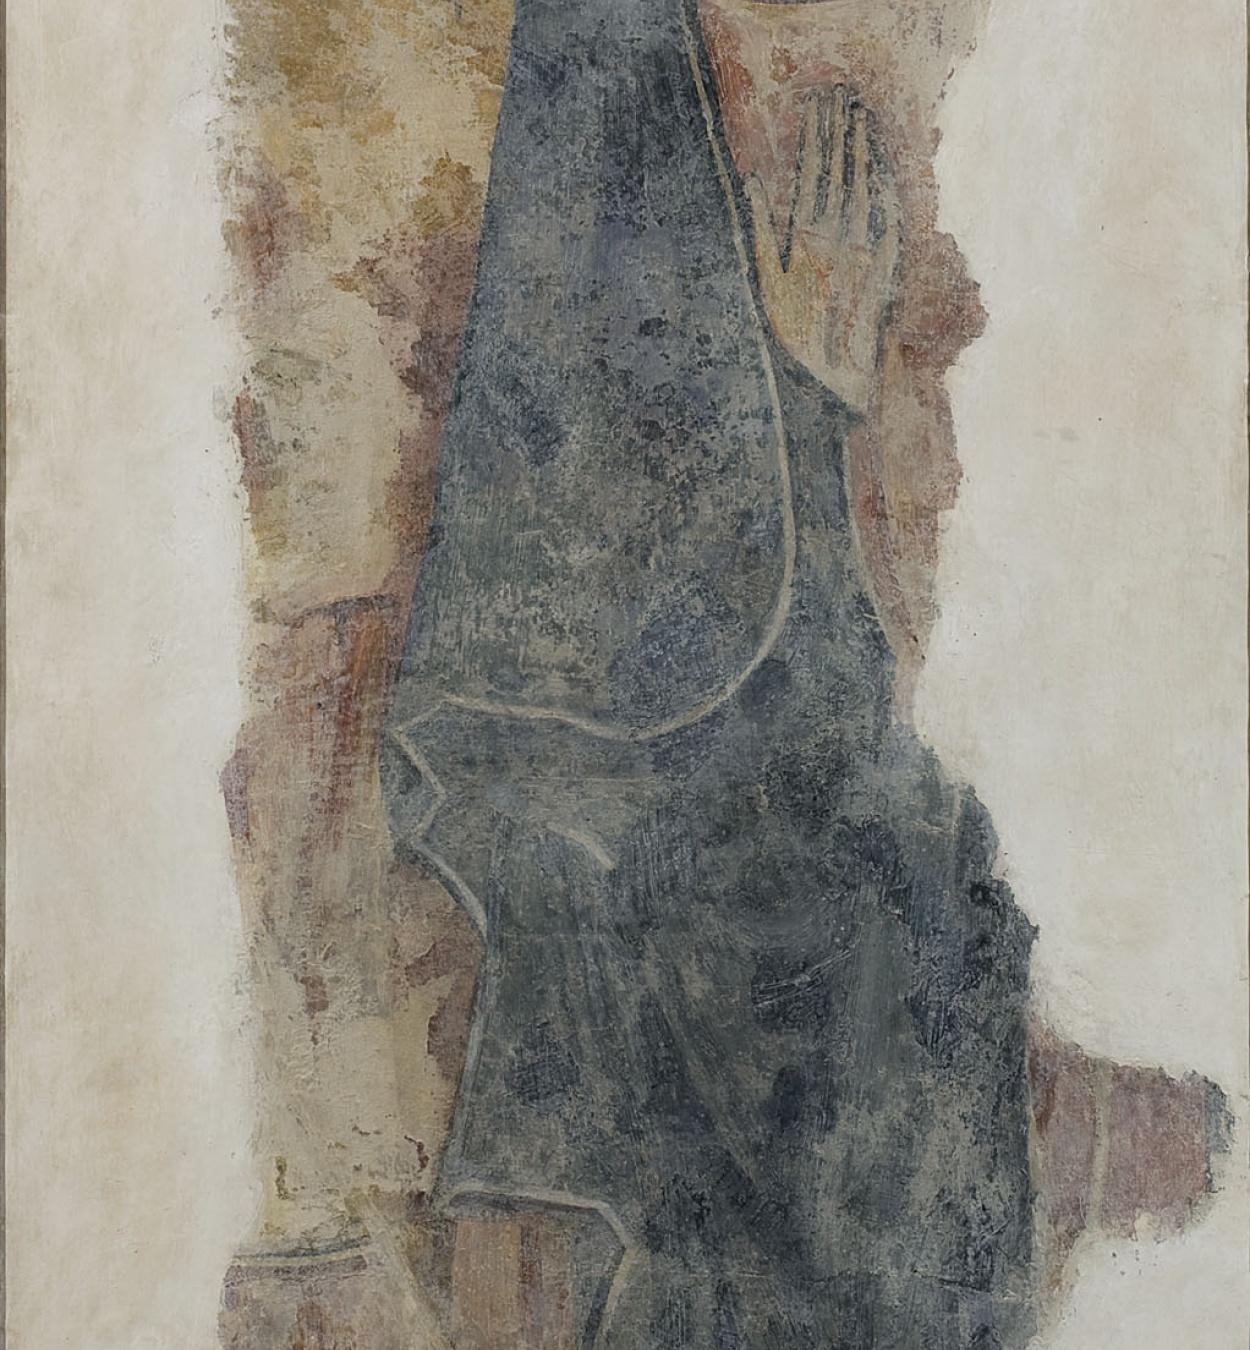 Anònim. Catalunya - Saint John the Evangelist of the Crucifixion, from Estaon - Mid-12th century